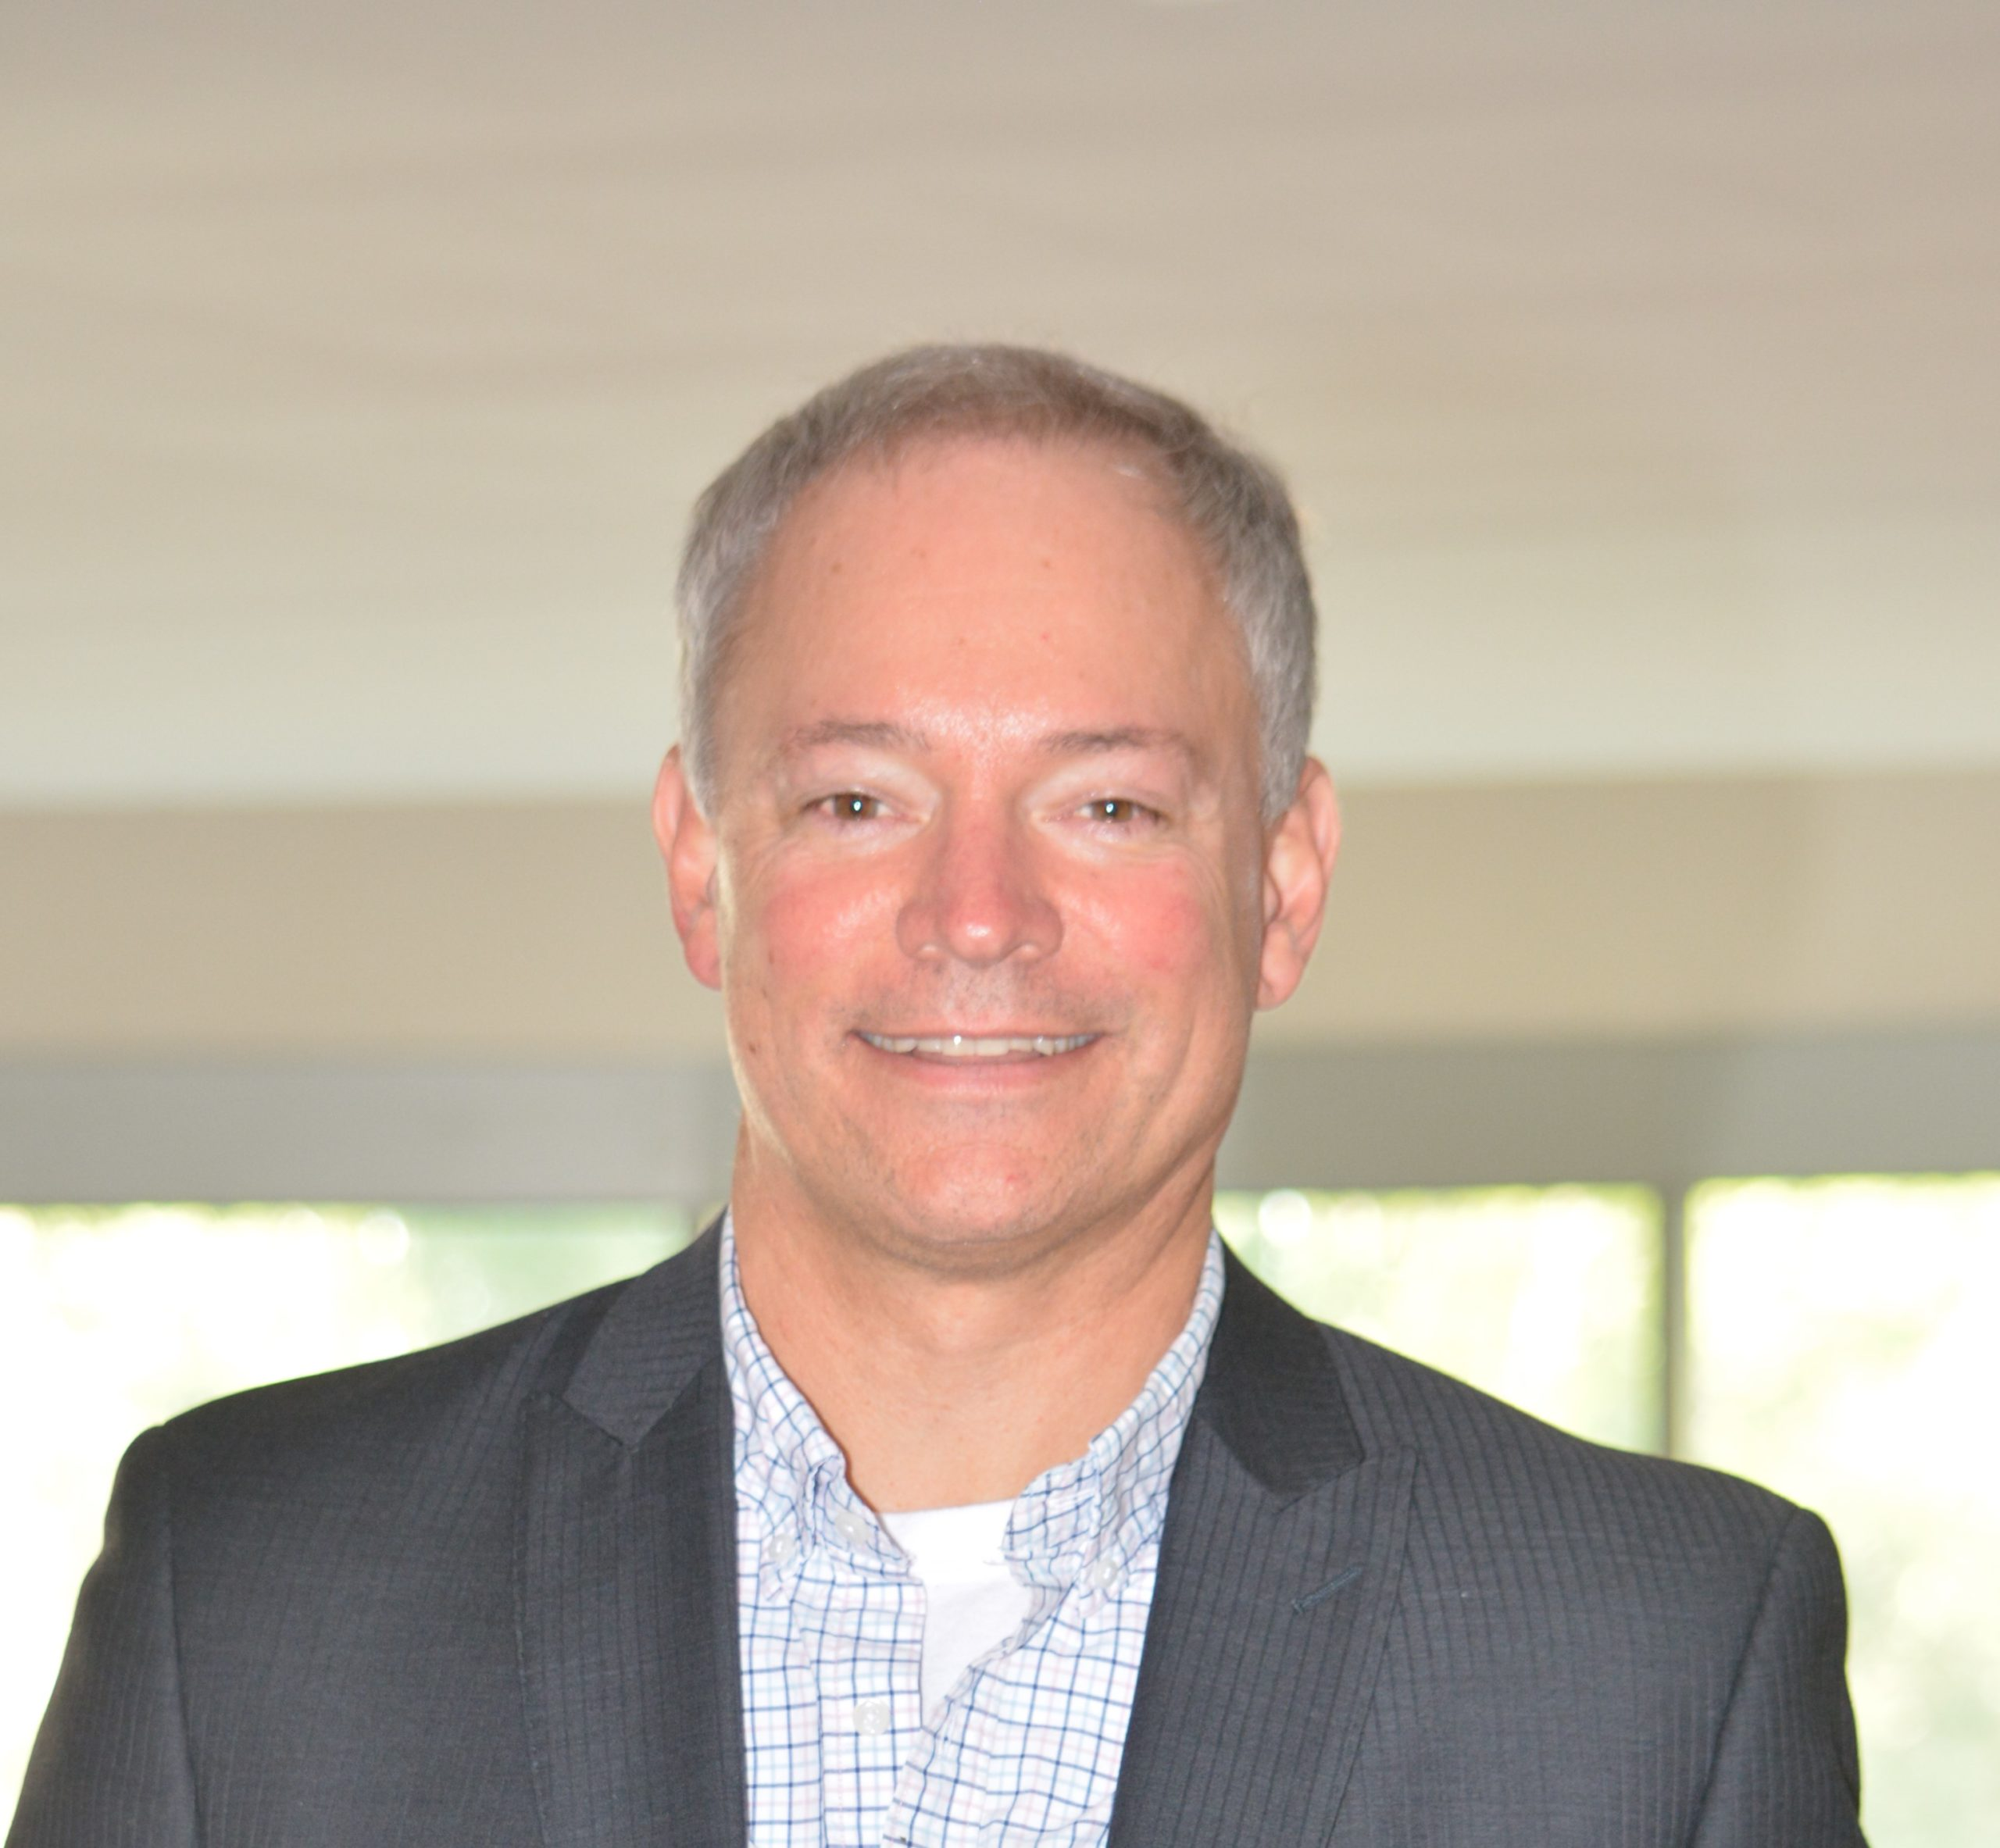 Jeff Reiter, PhD, ABPP